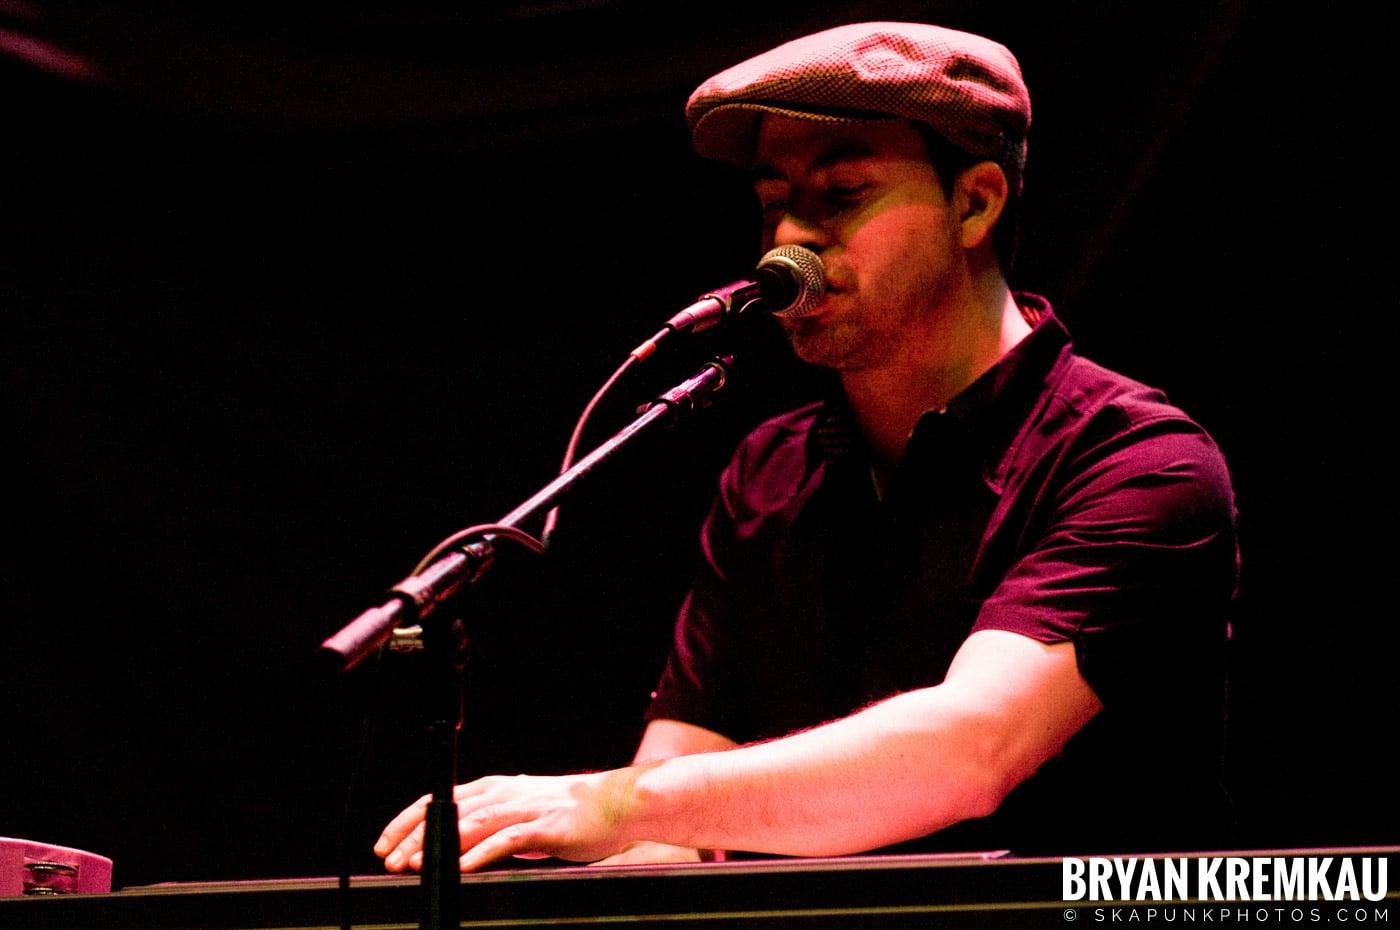 Frank Turner @ Hammerstein Ballroom, NYC - 3.2.10 (16)